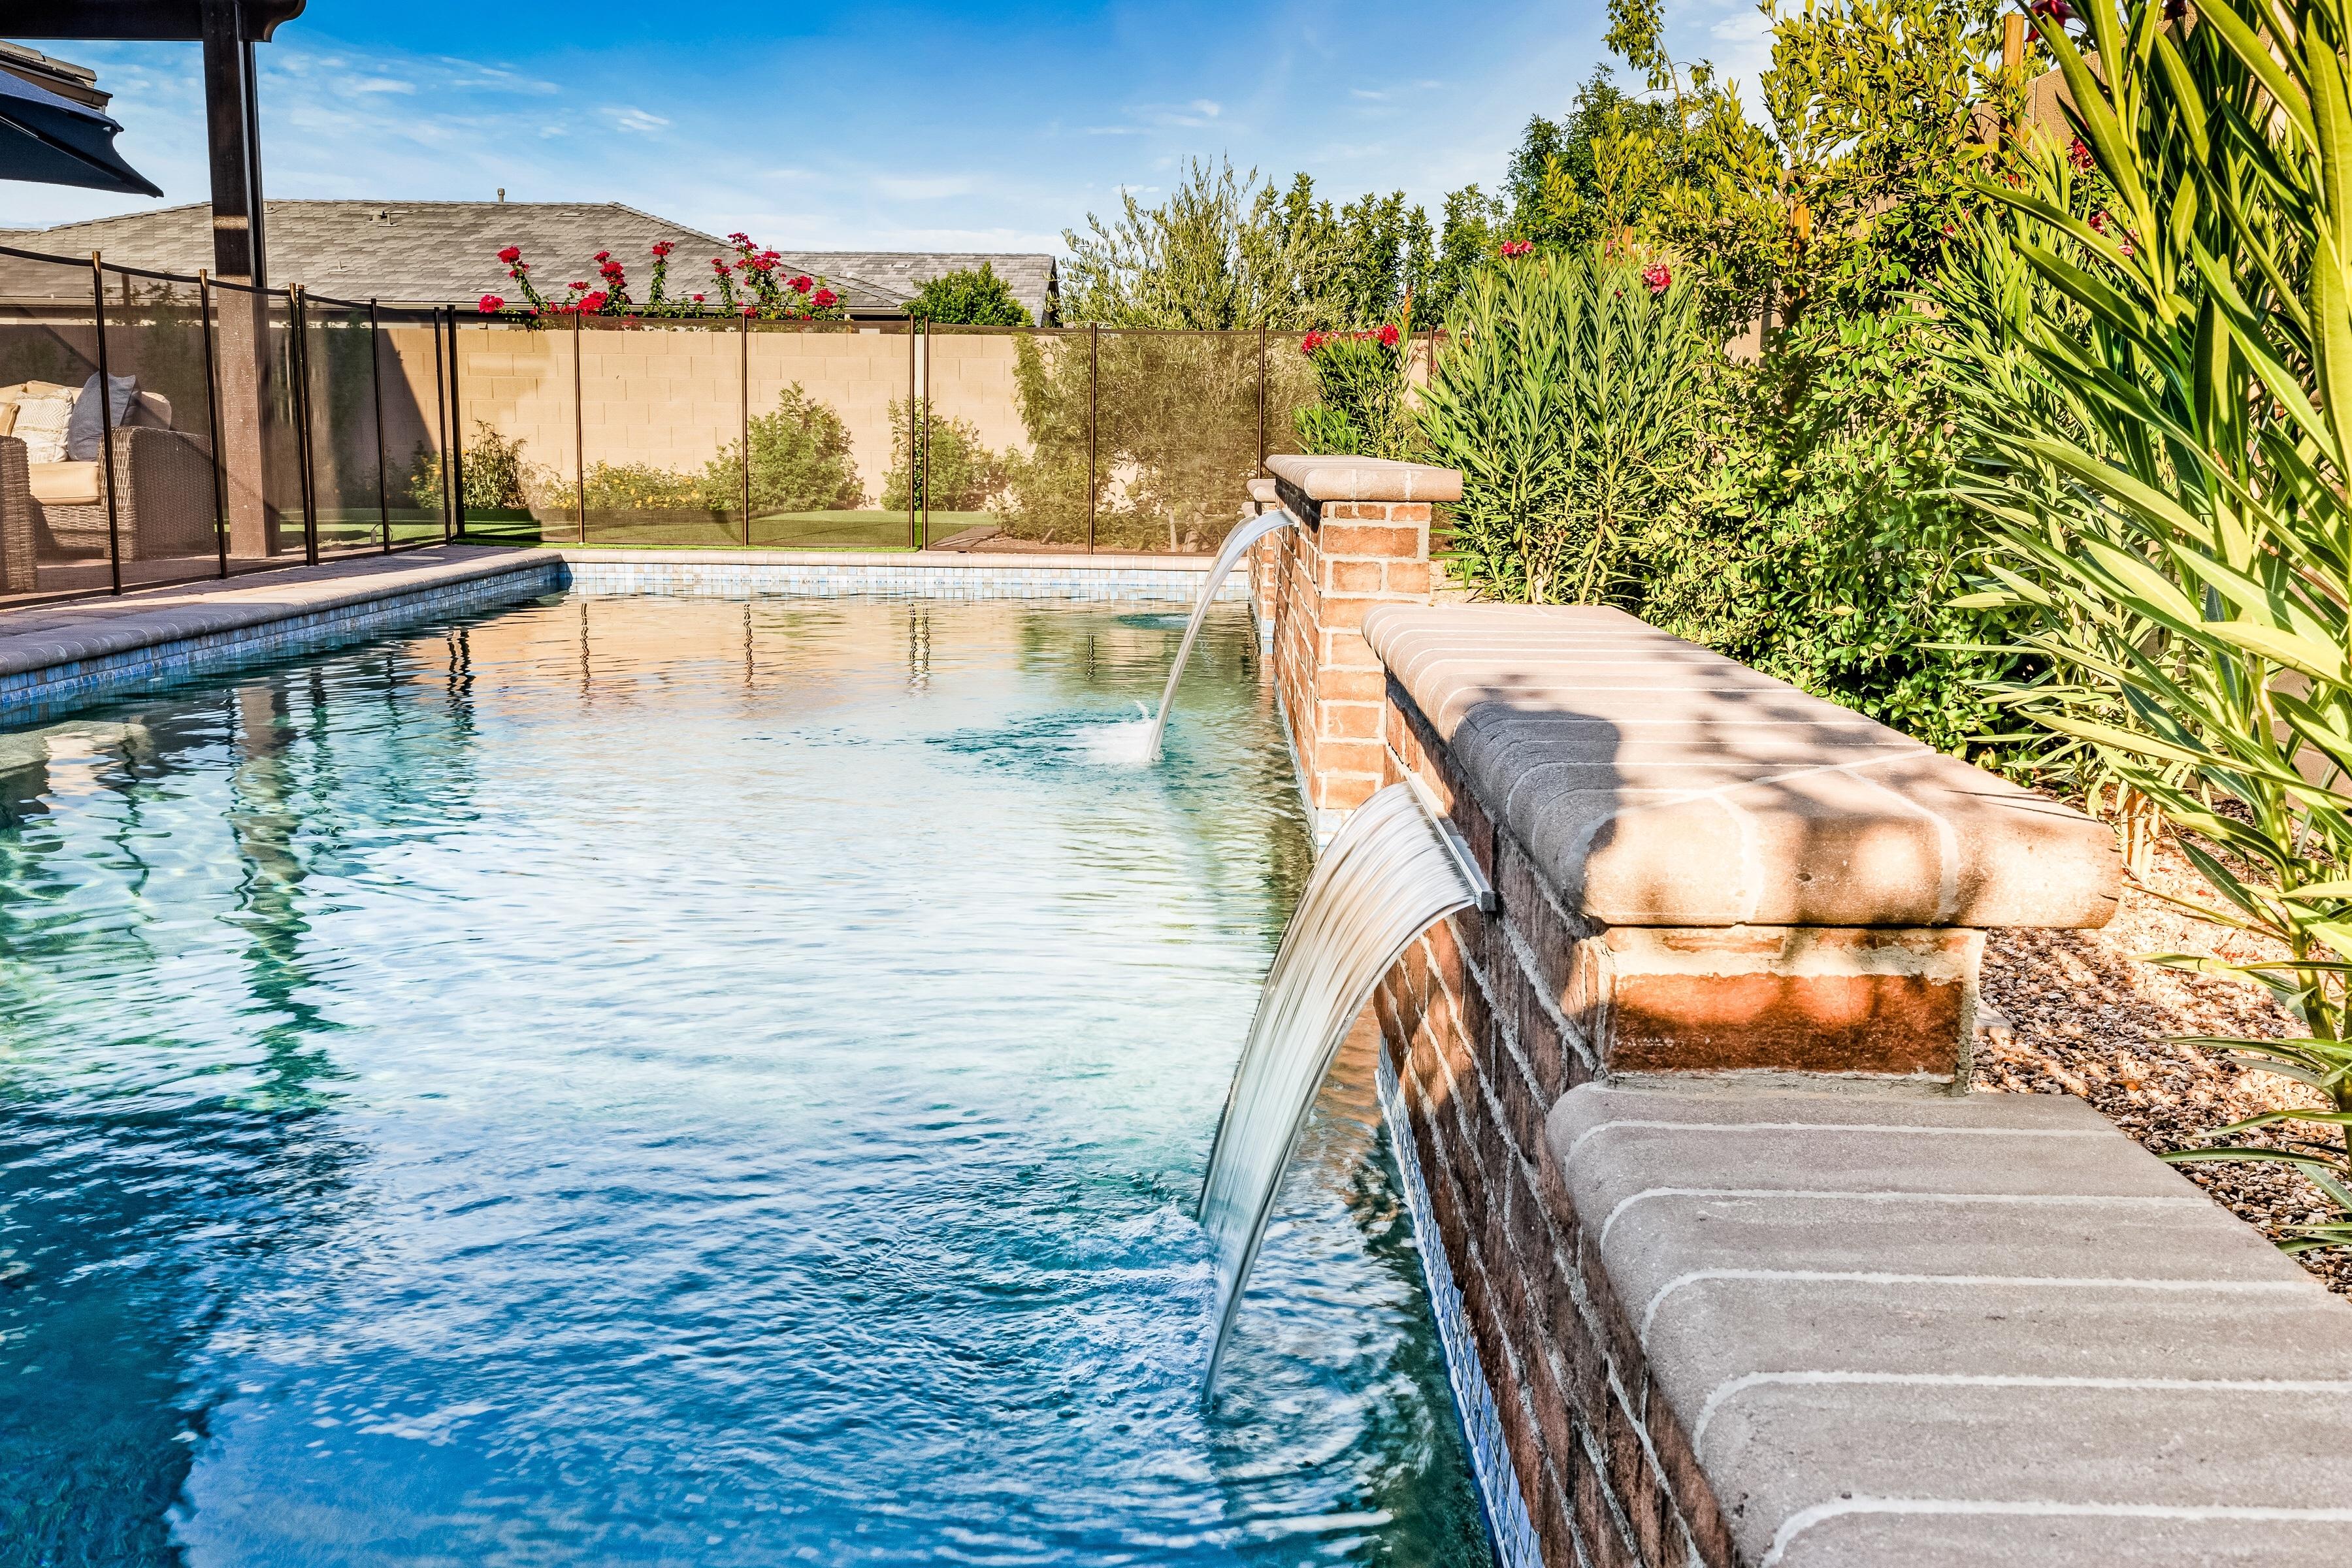 Licensed Residential Pool Renovations in Scottsdale